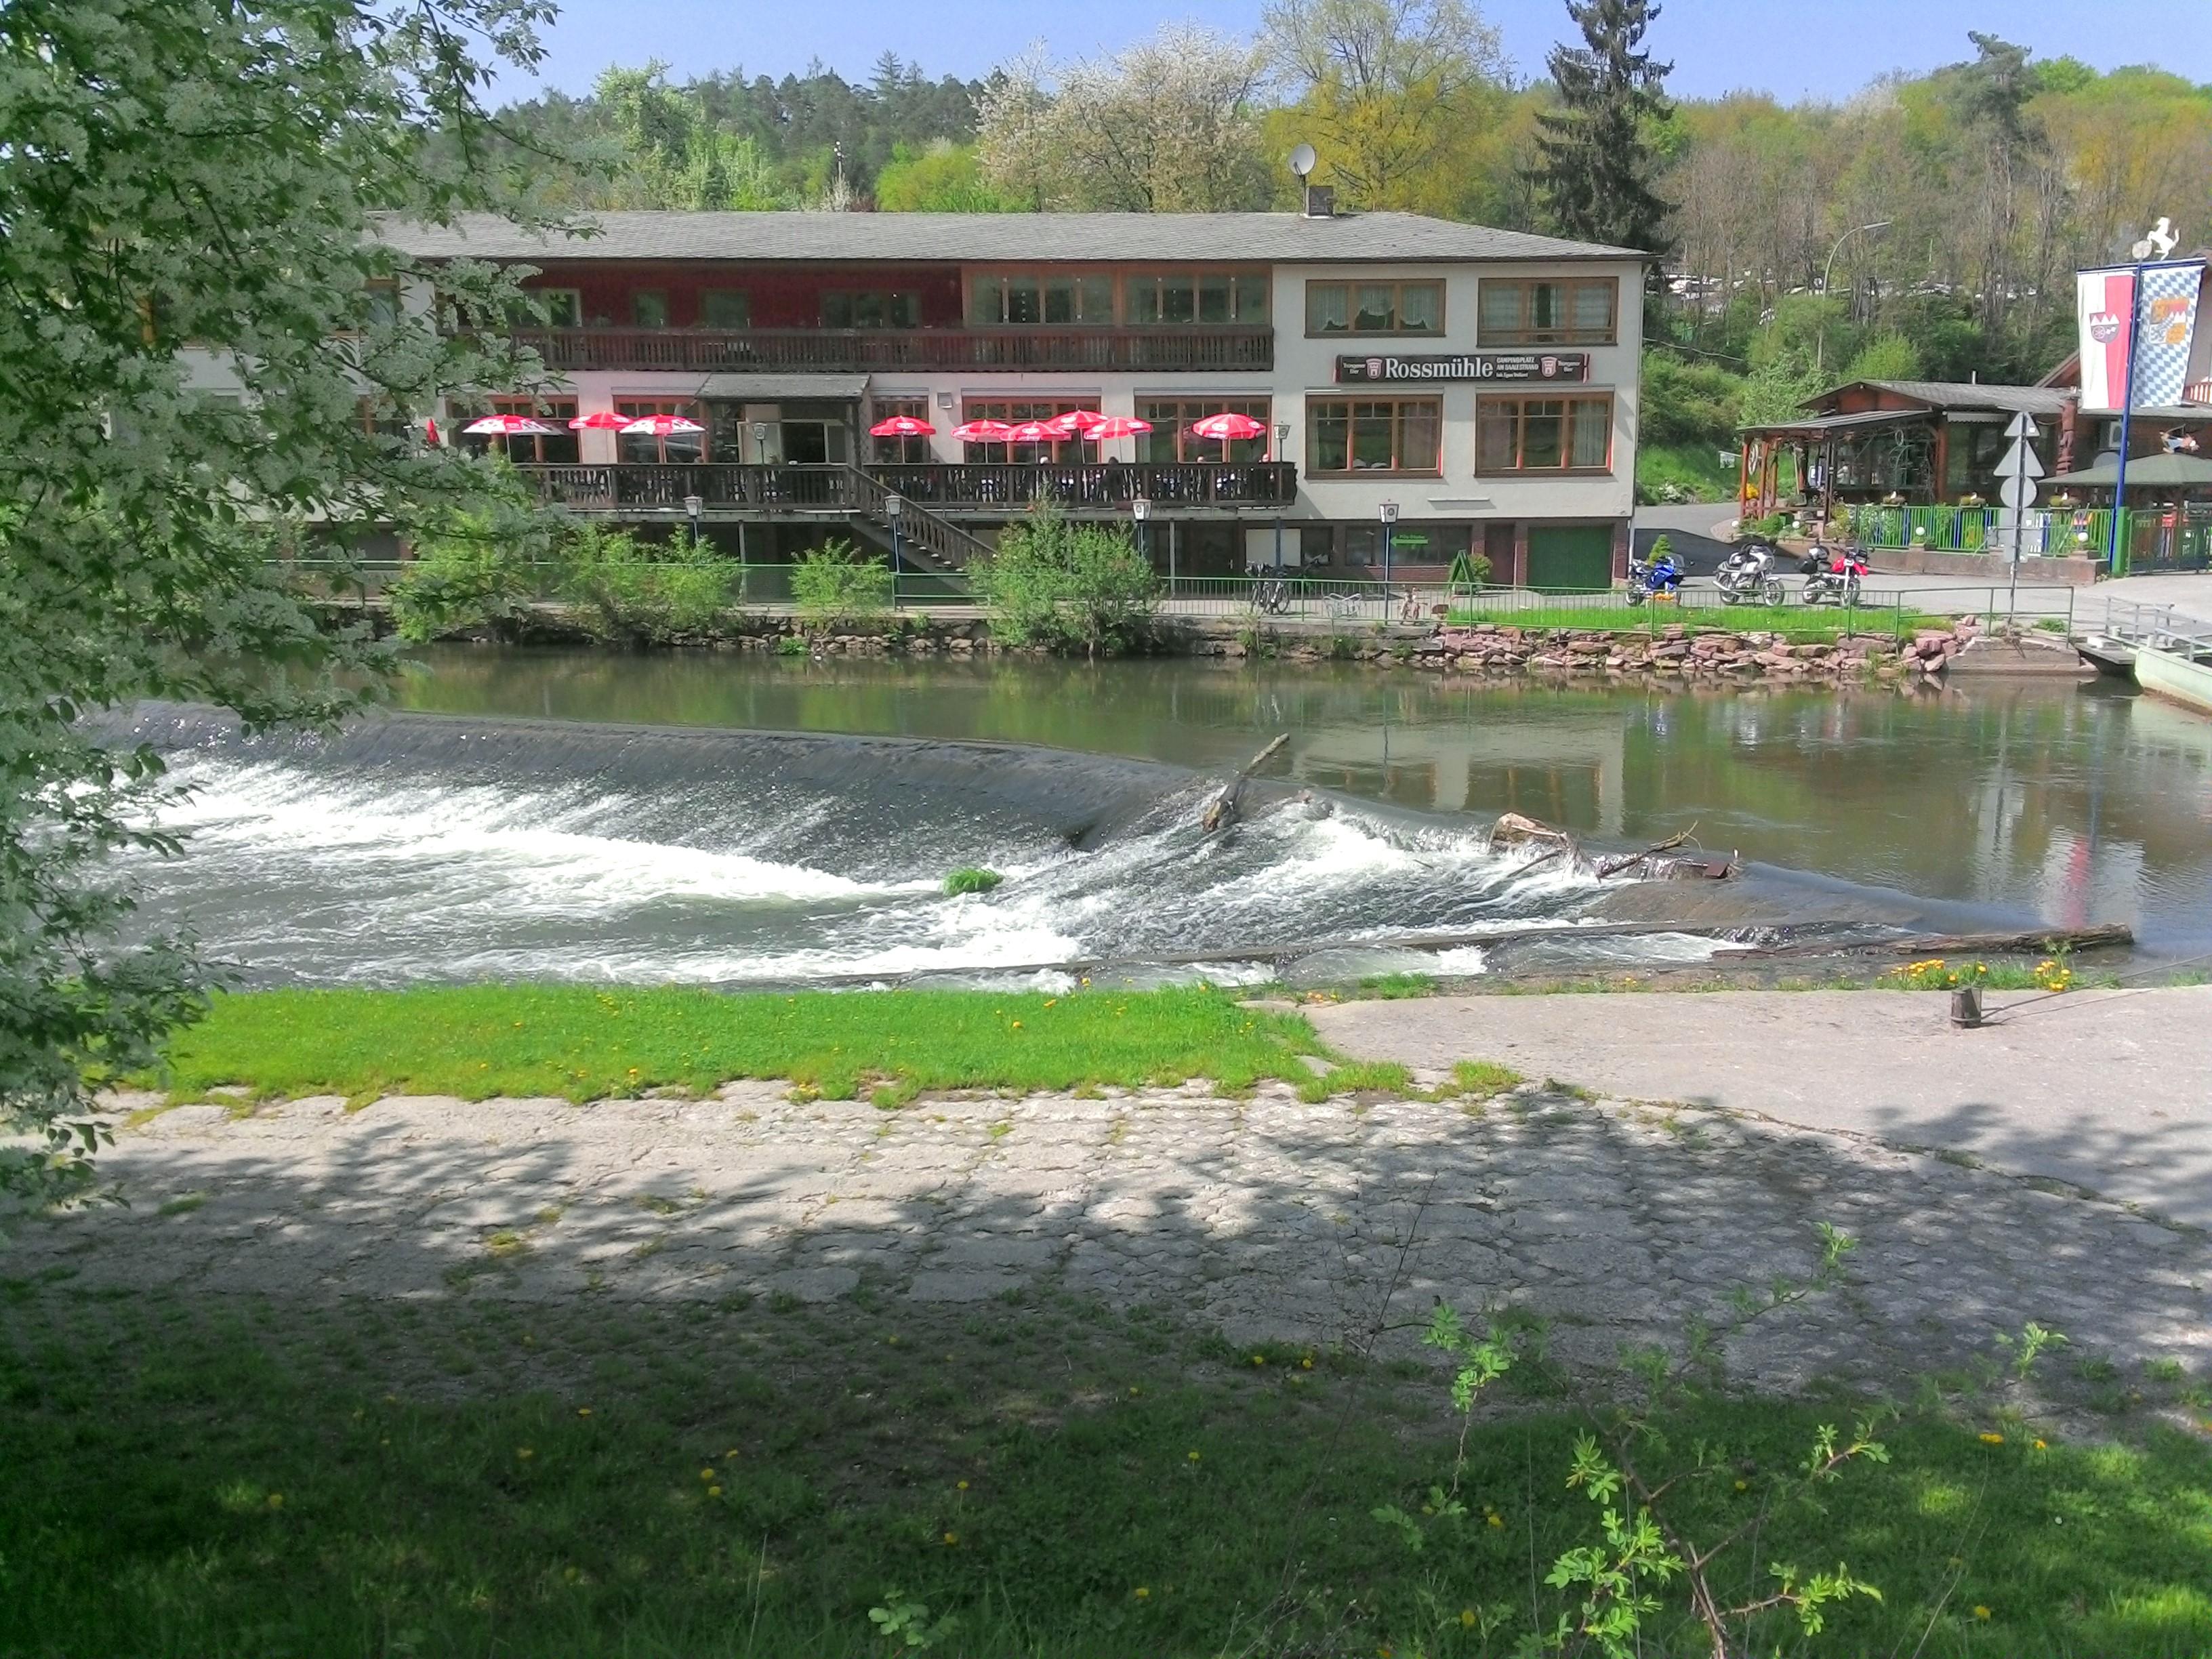 Restaurant Roßmühle